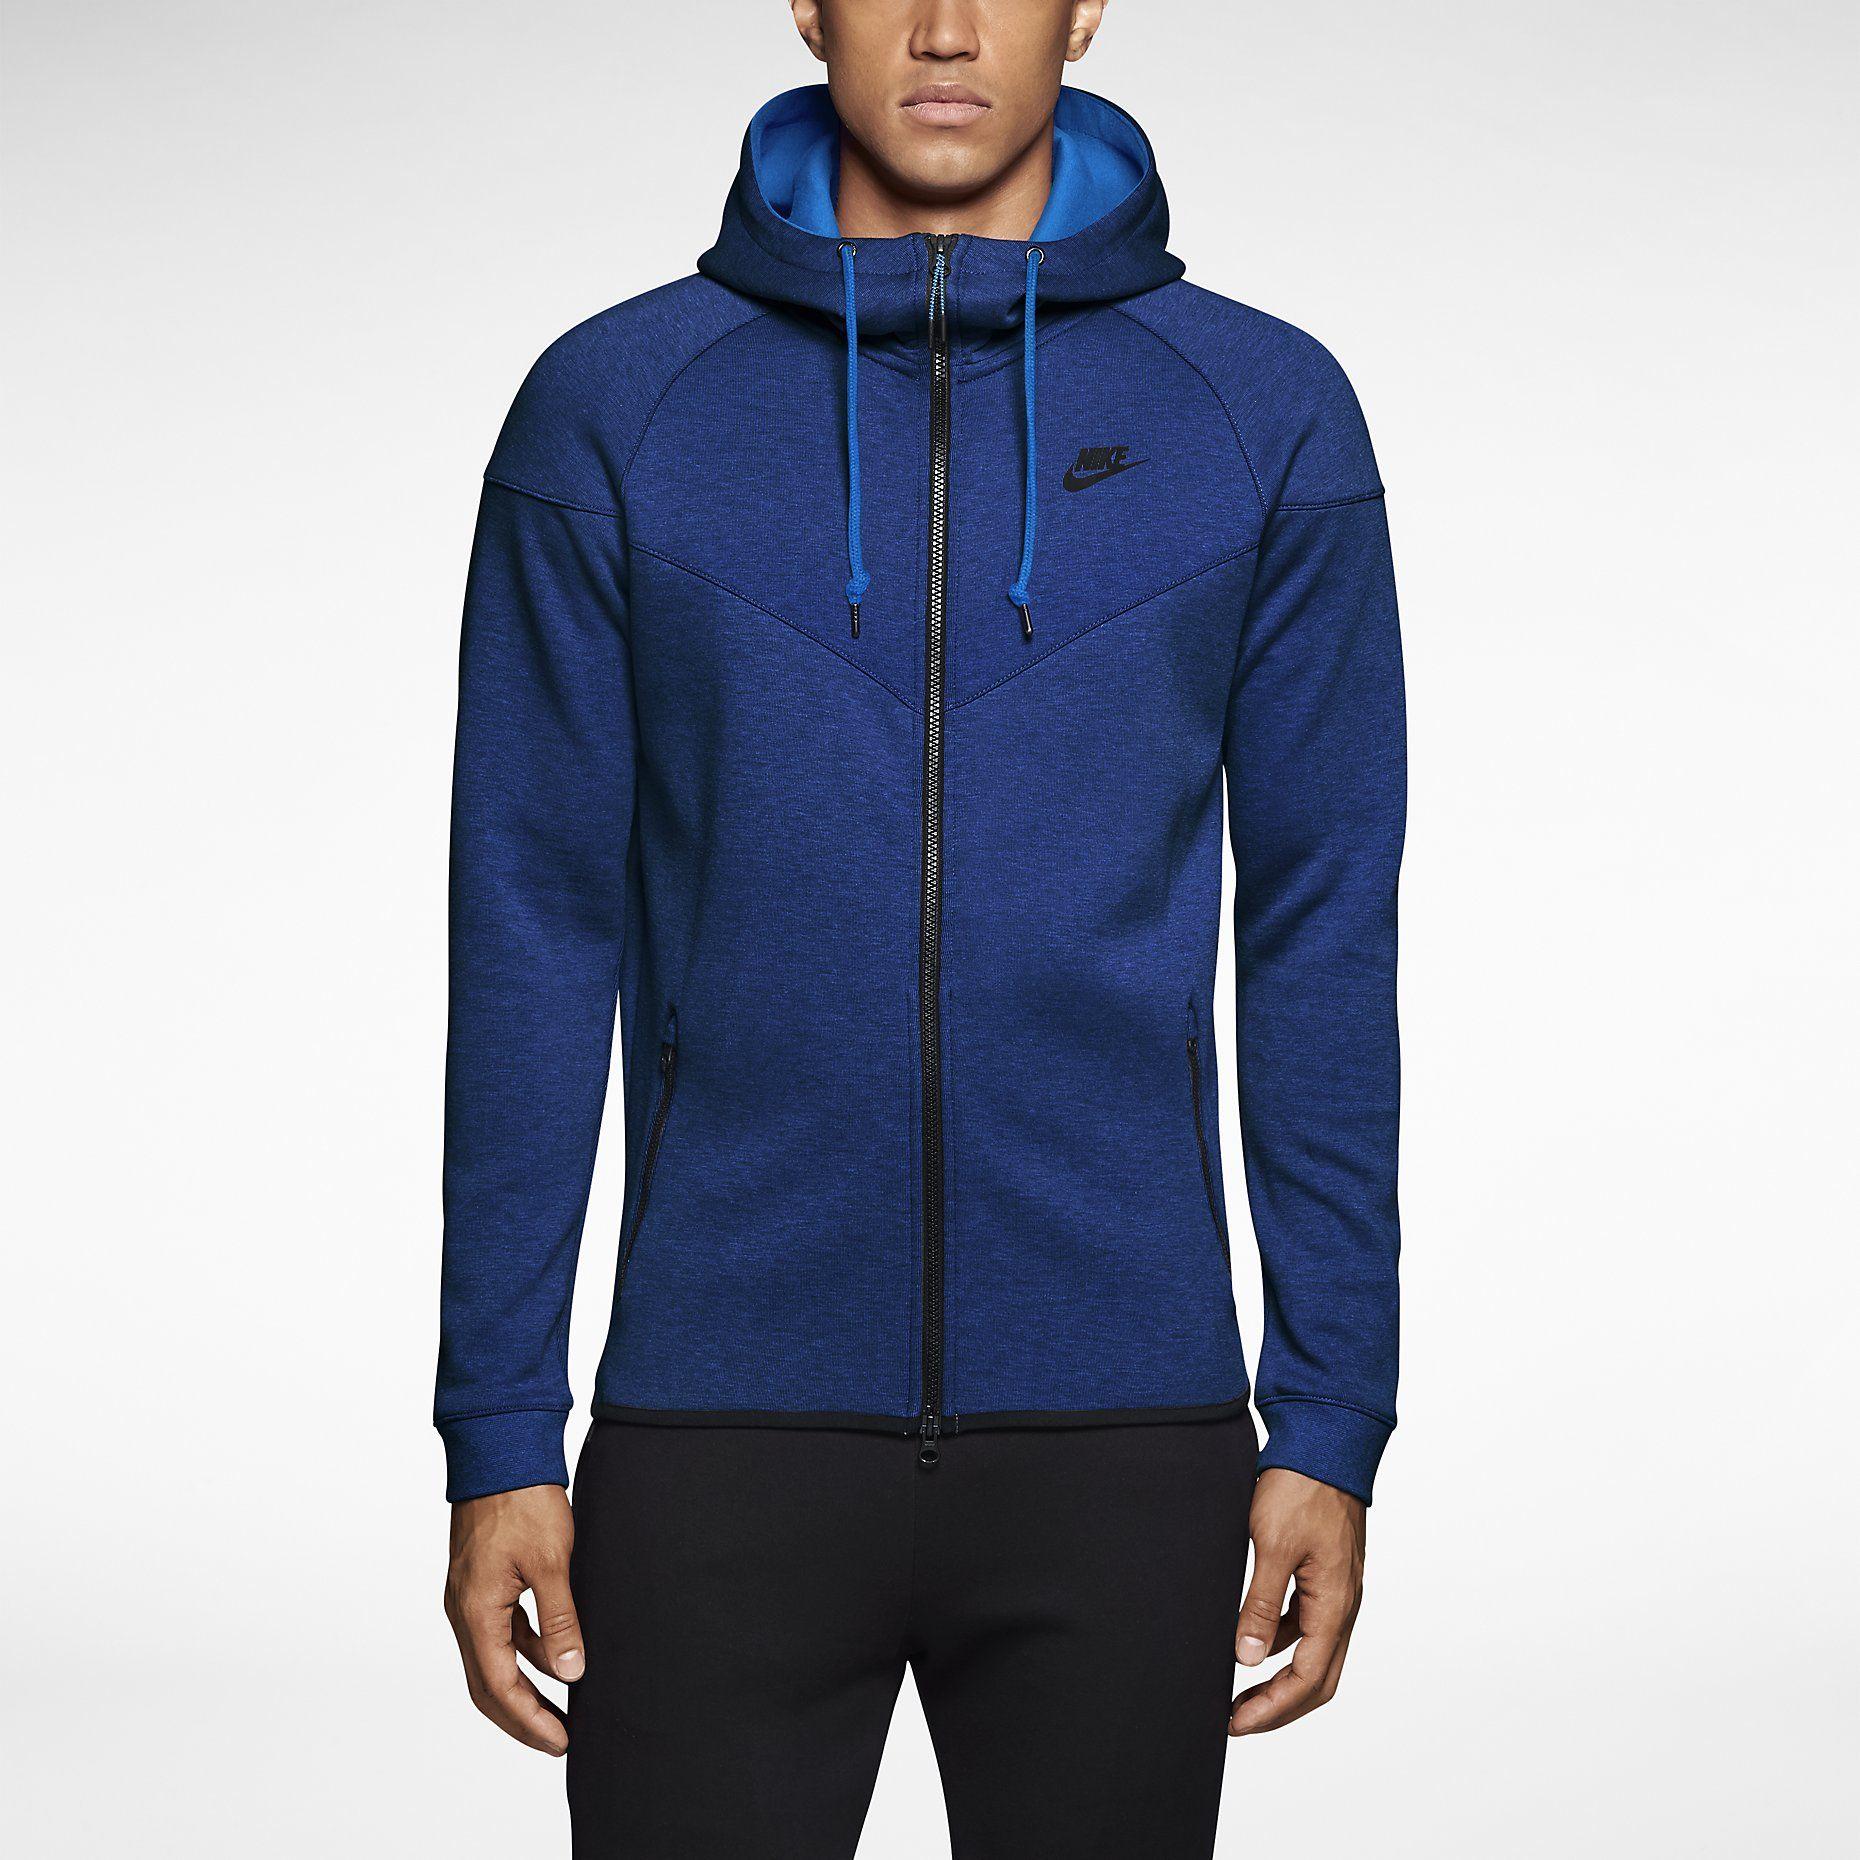 Nike Tech Fleece Windrunner Men's Hoodie. Nike Store UK